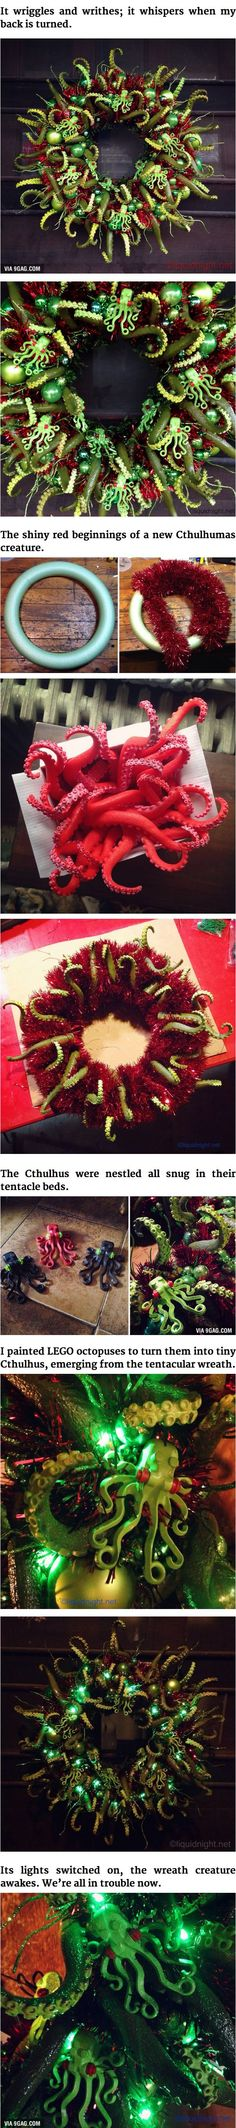 Cthulhu-Themed Christmas Wreath! So Many Tentacles. Merry Cthulhumas!